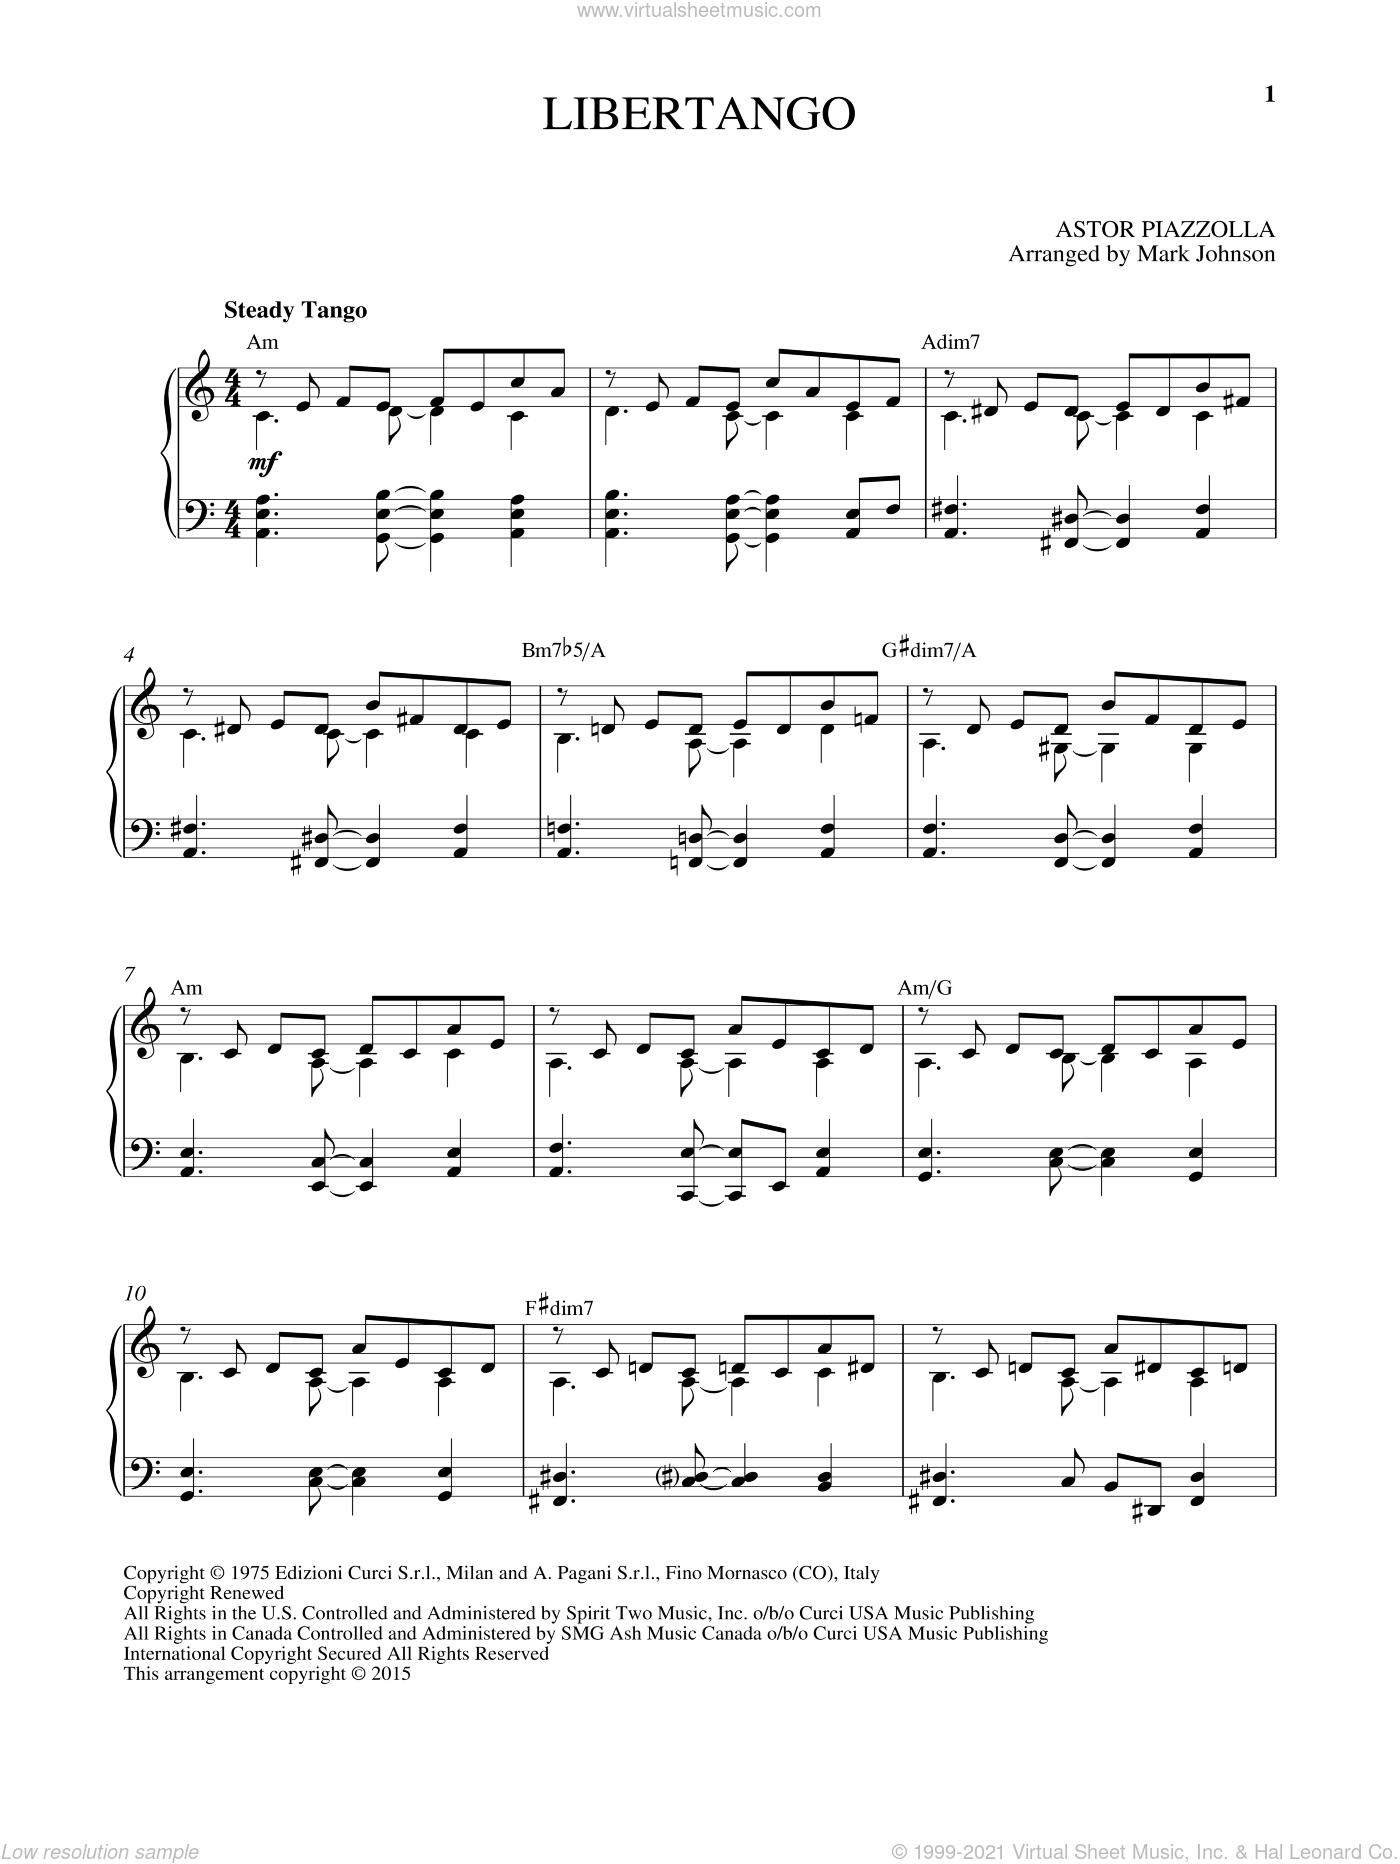 Libertango sheet music for piano solo by Astor Piazzolla, classical score, intermediate skill level